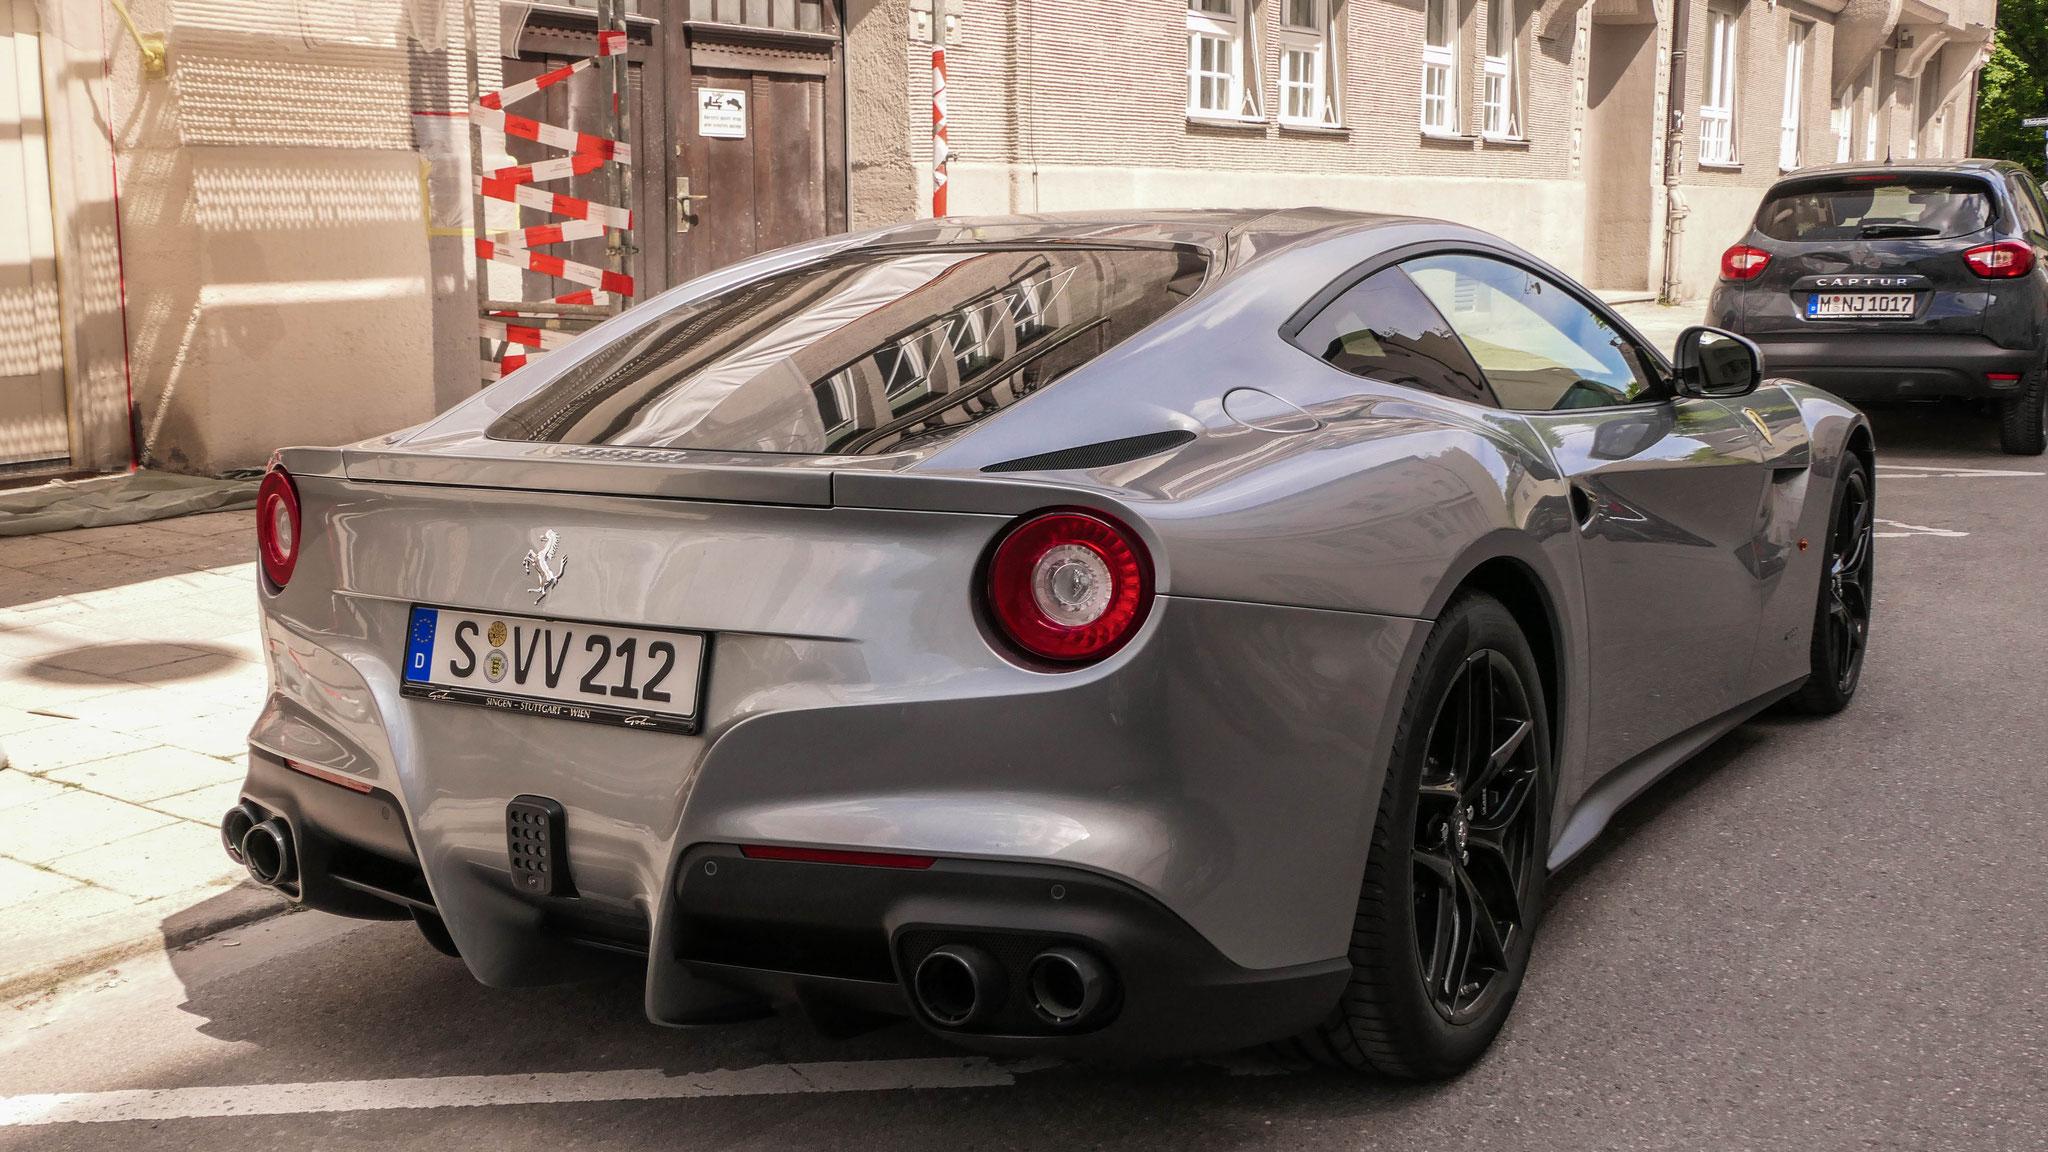 Ferrari F12 Berlinetta - S-VV-212